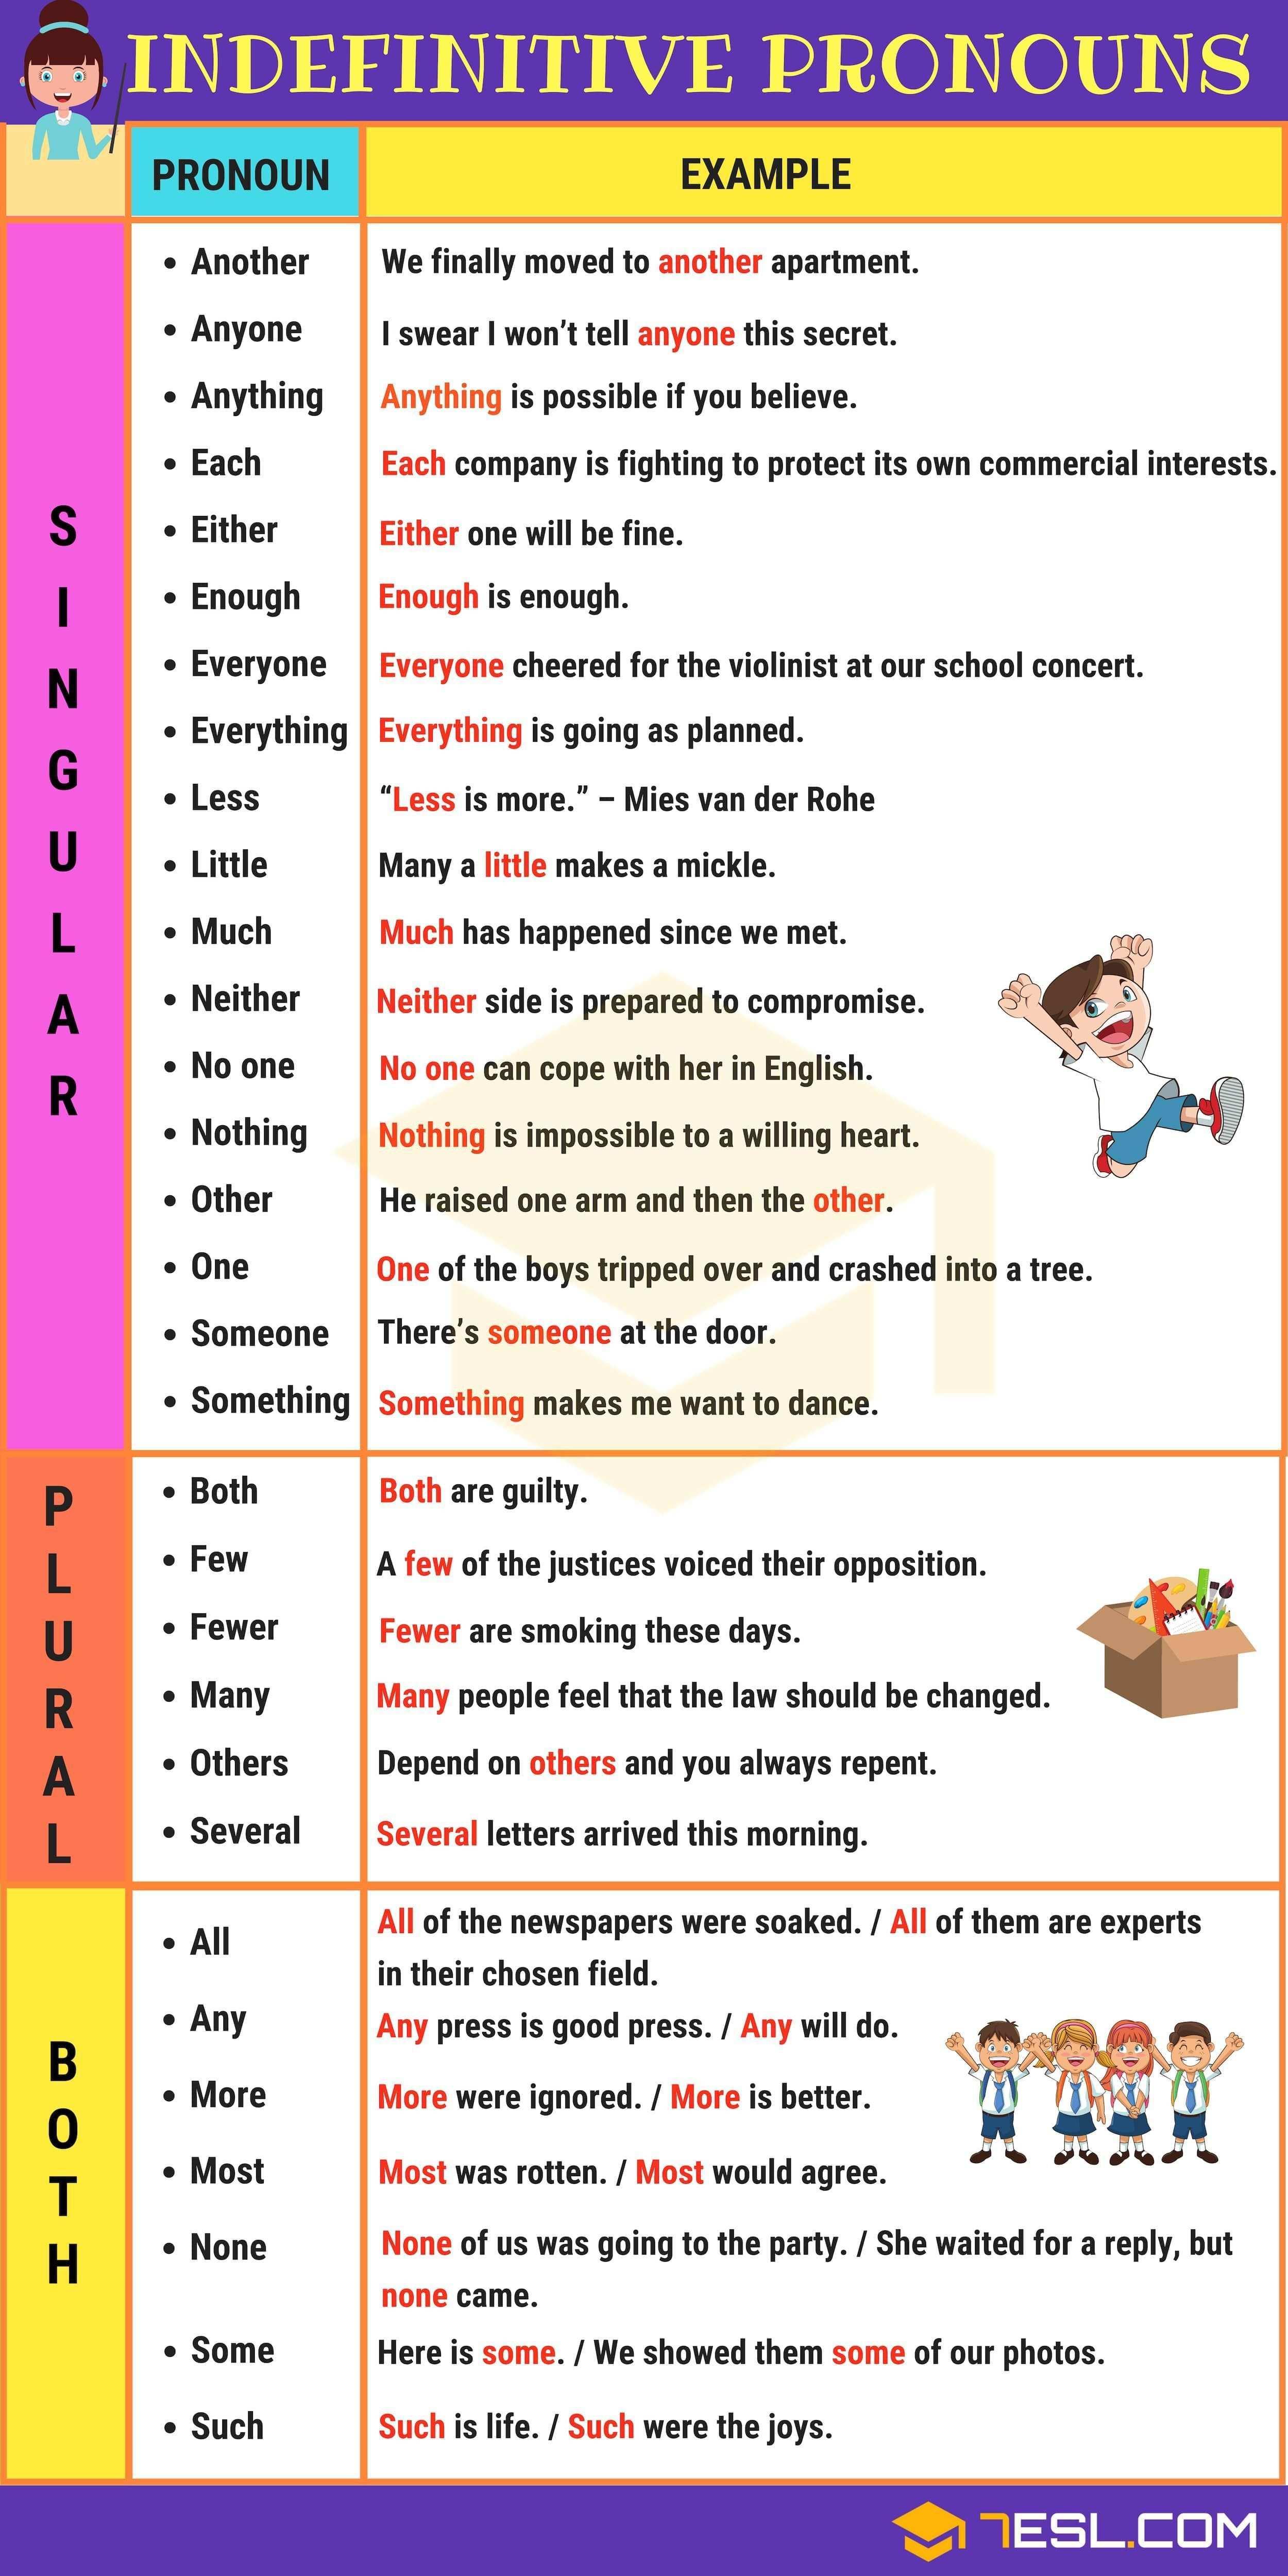 Indefinite Pronouns Useful Singular Plural List Examples Indefinite Pronouns What Is An Indefinite English Grammar Learn English Vocabulary Learn English